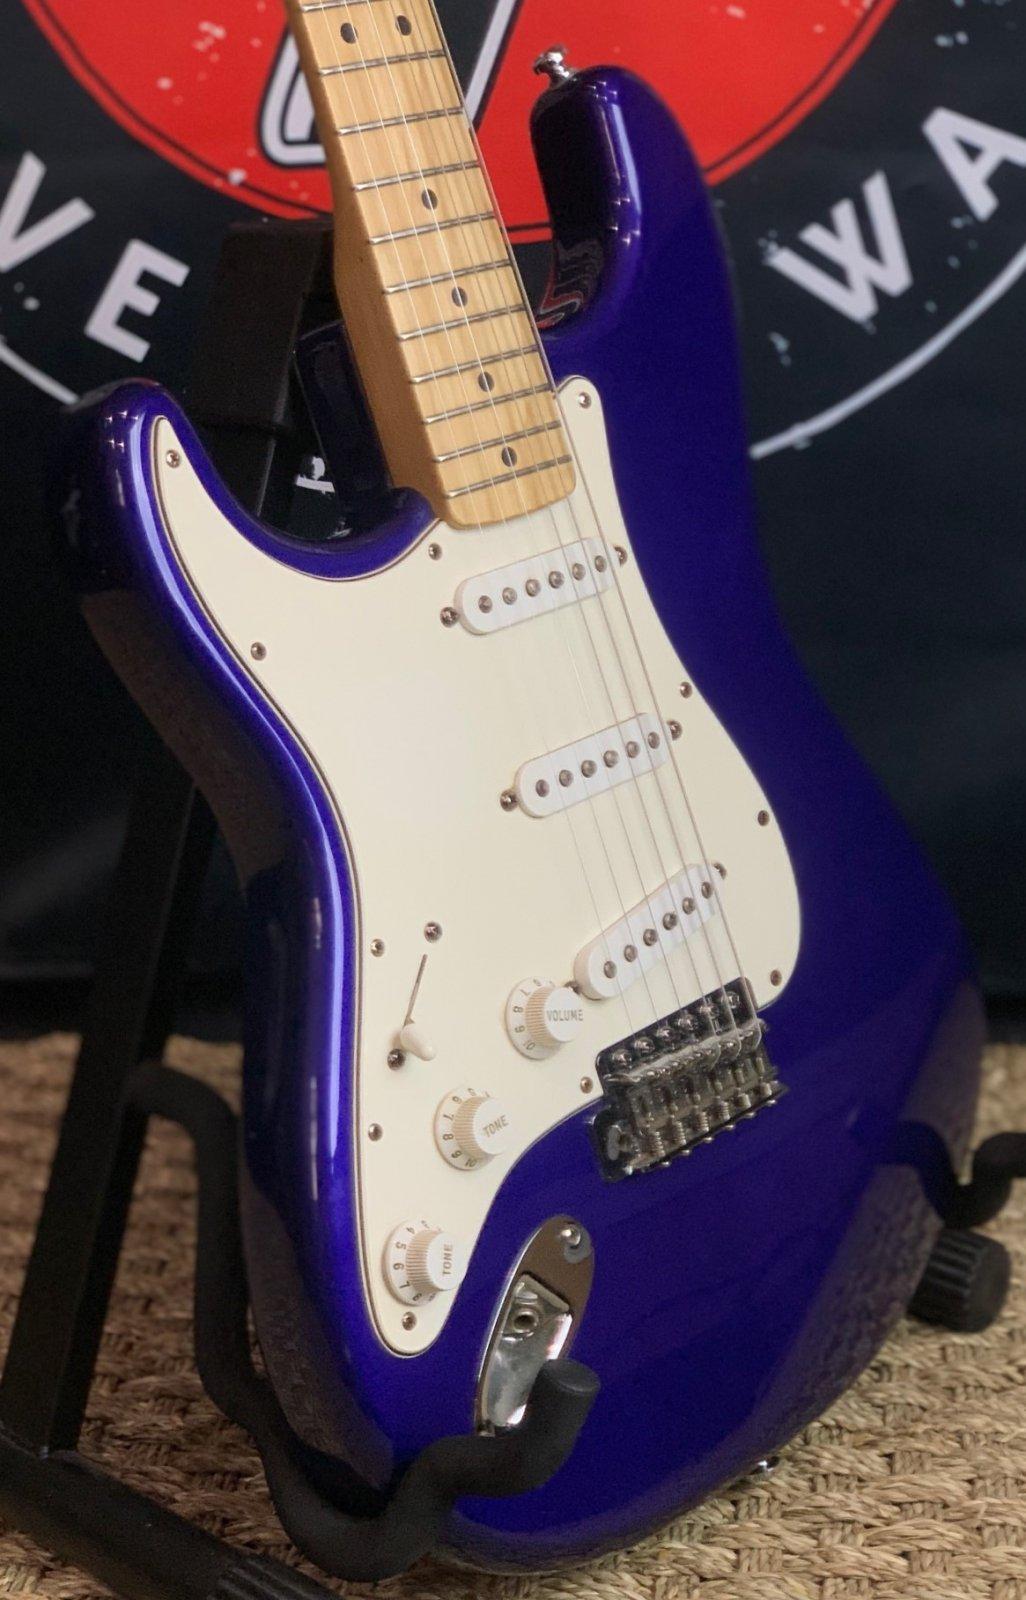 2002 Fender Stratocaster Lefty MIM